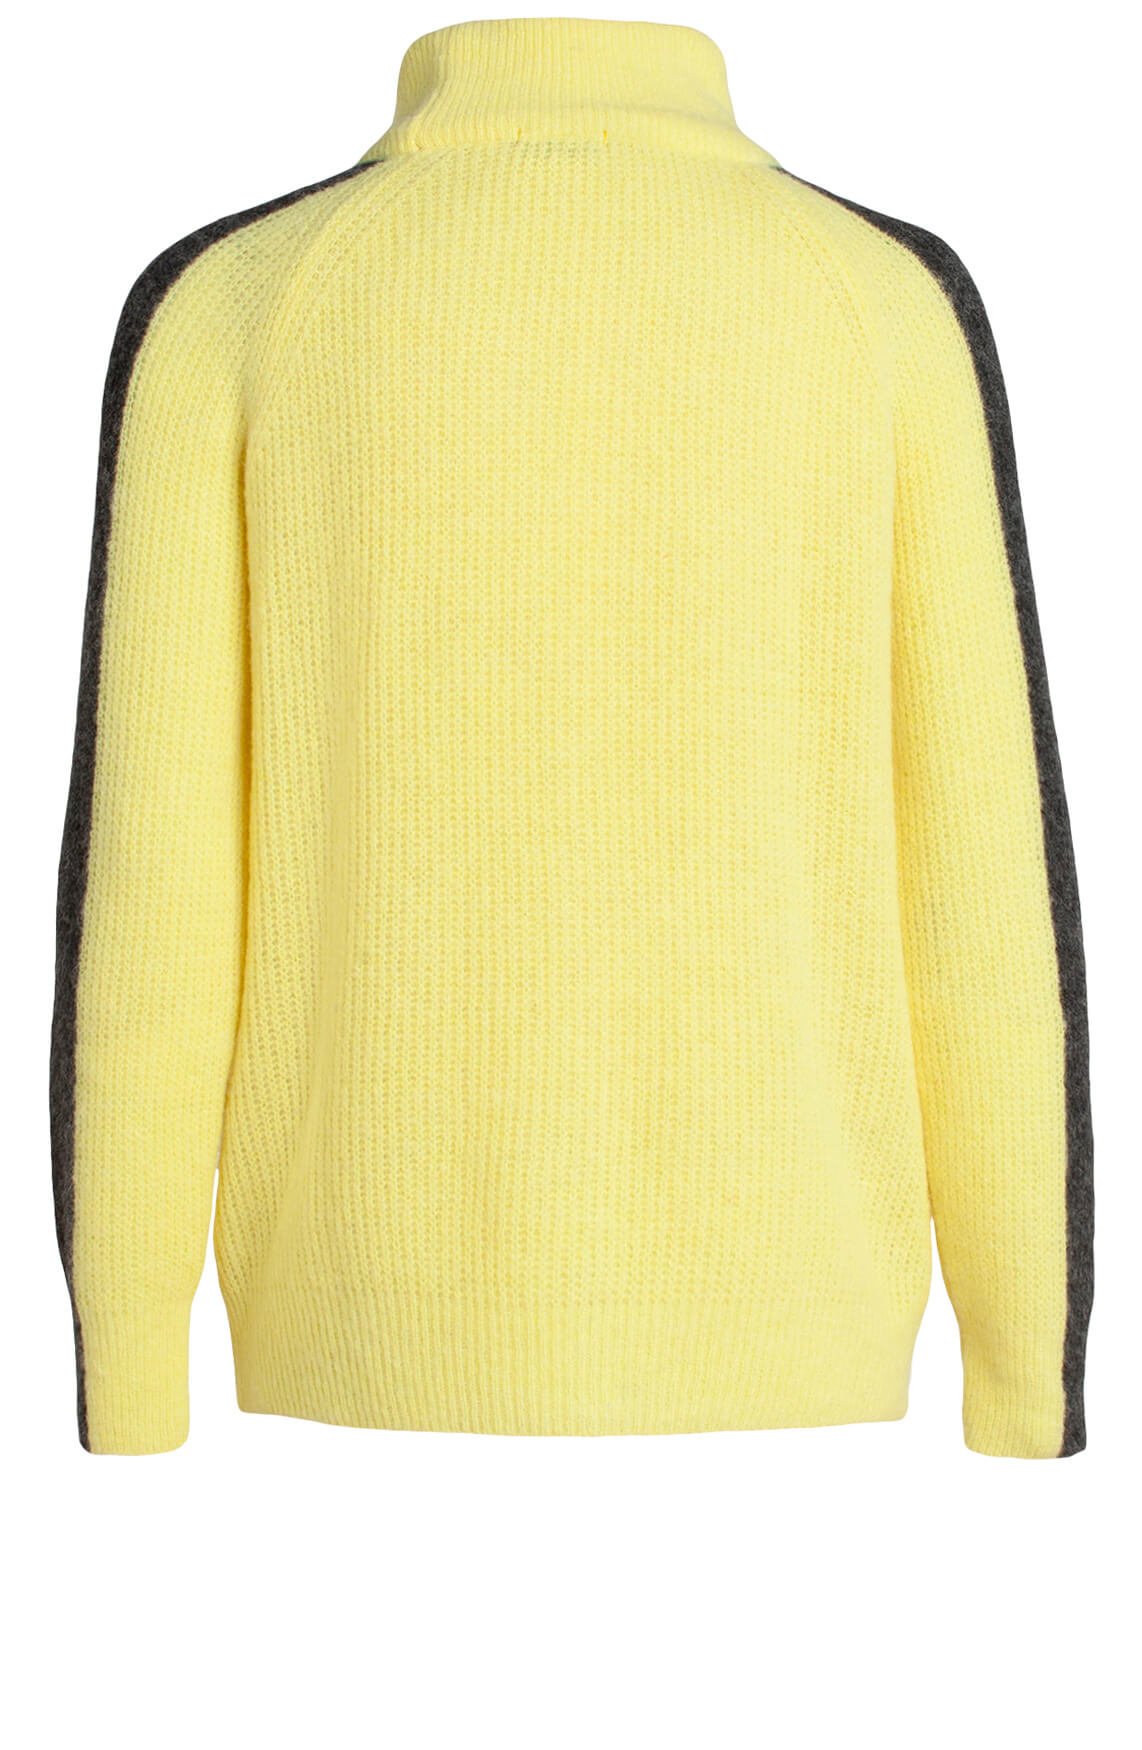 Anna Blue Dames Wollen trui met bies geel